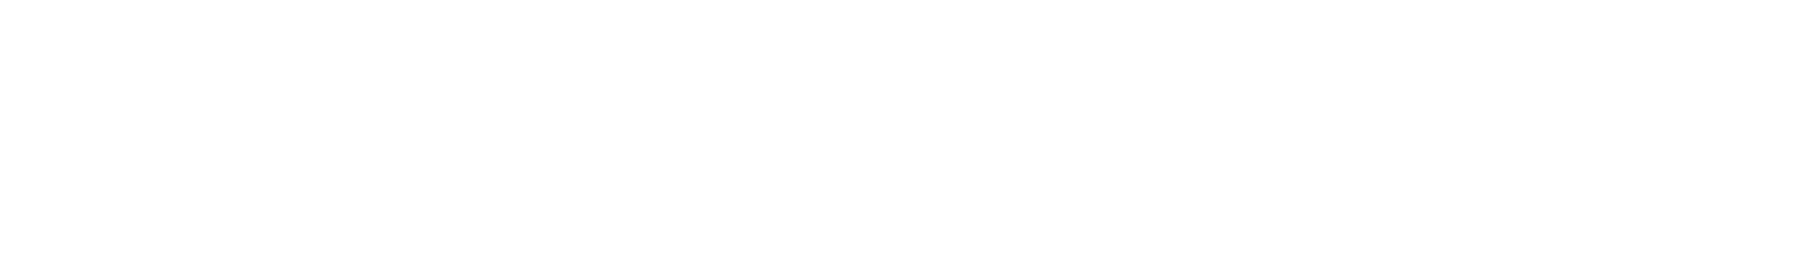 125 c tenor sp01